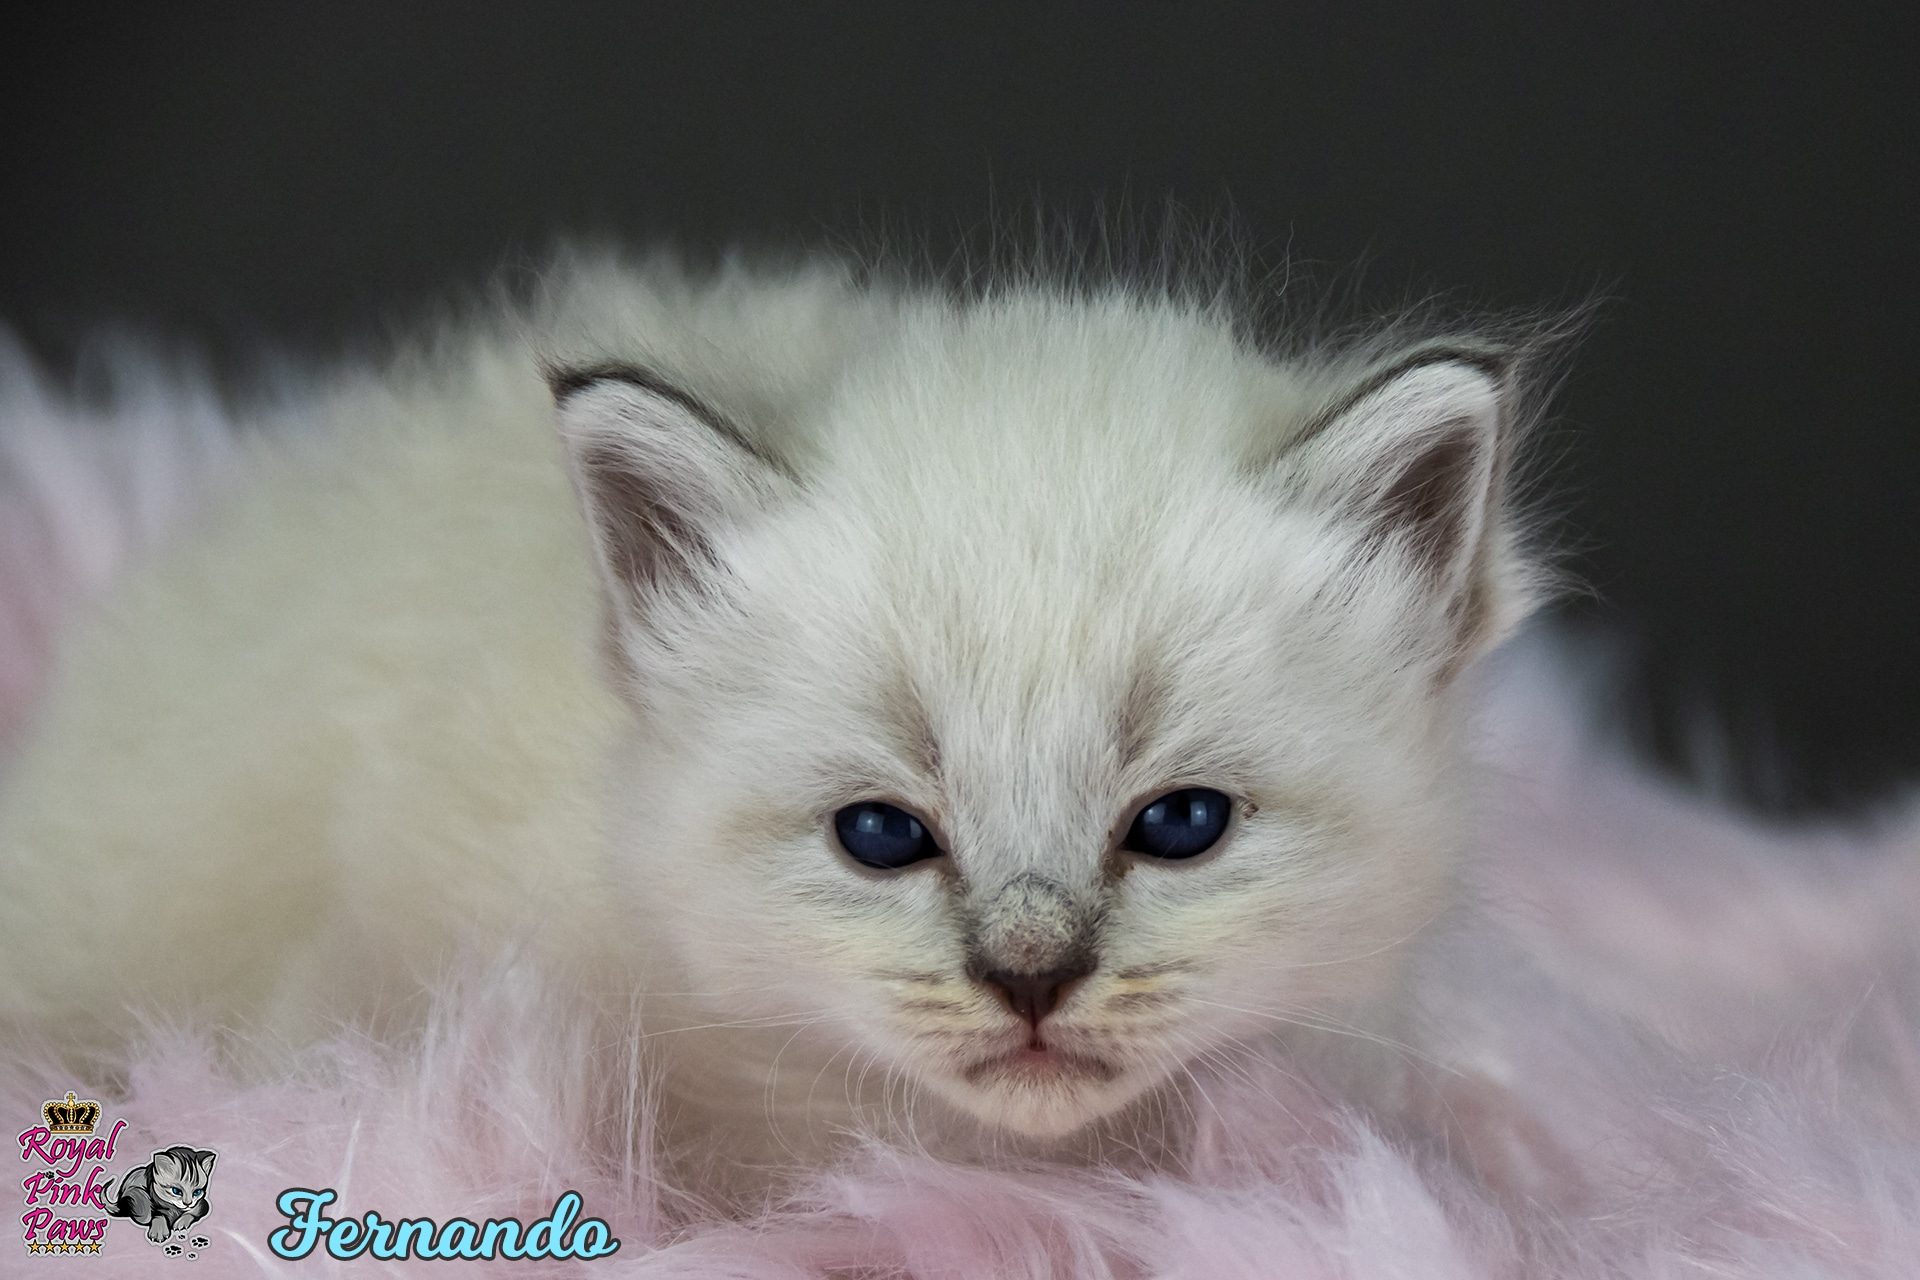 Neva Masquarade - Fernando Royal Pink Paws